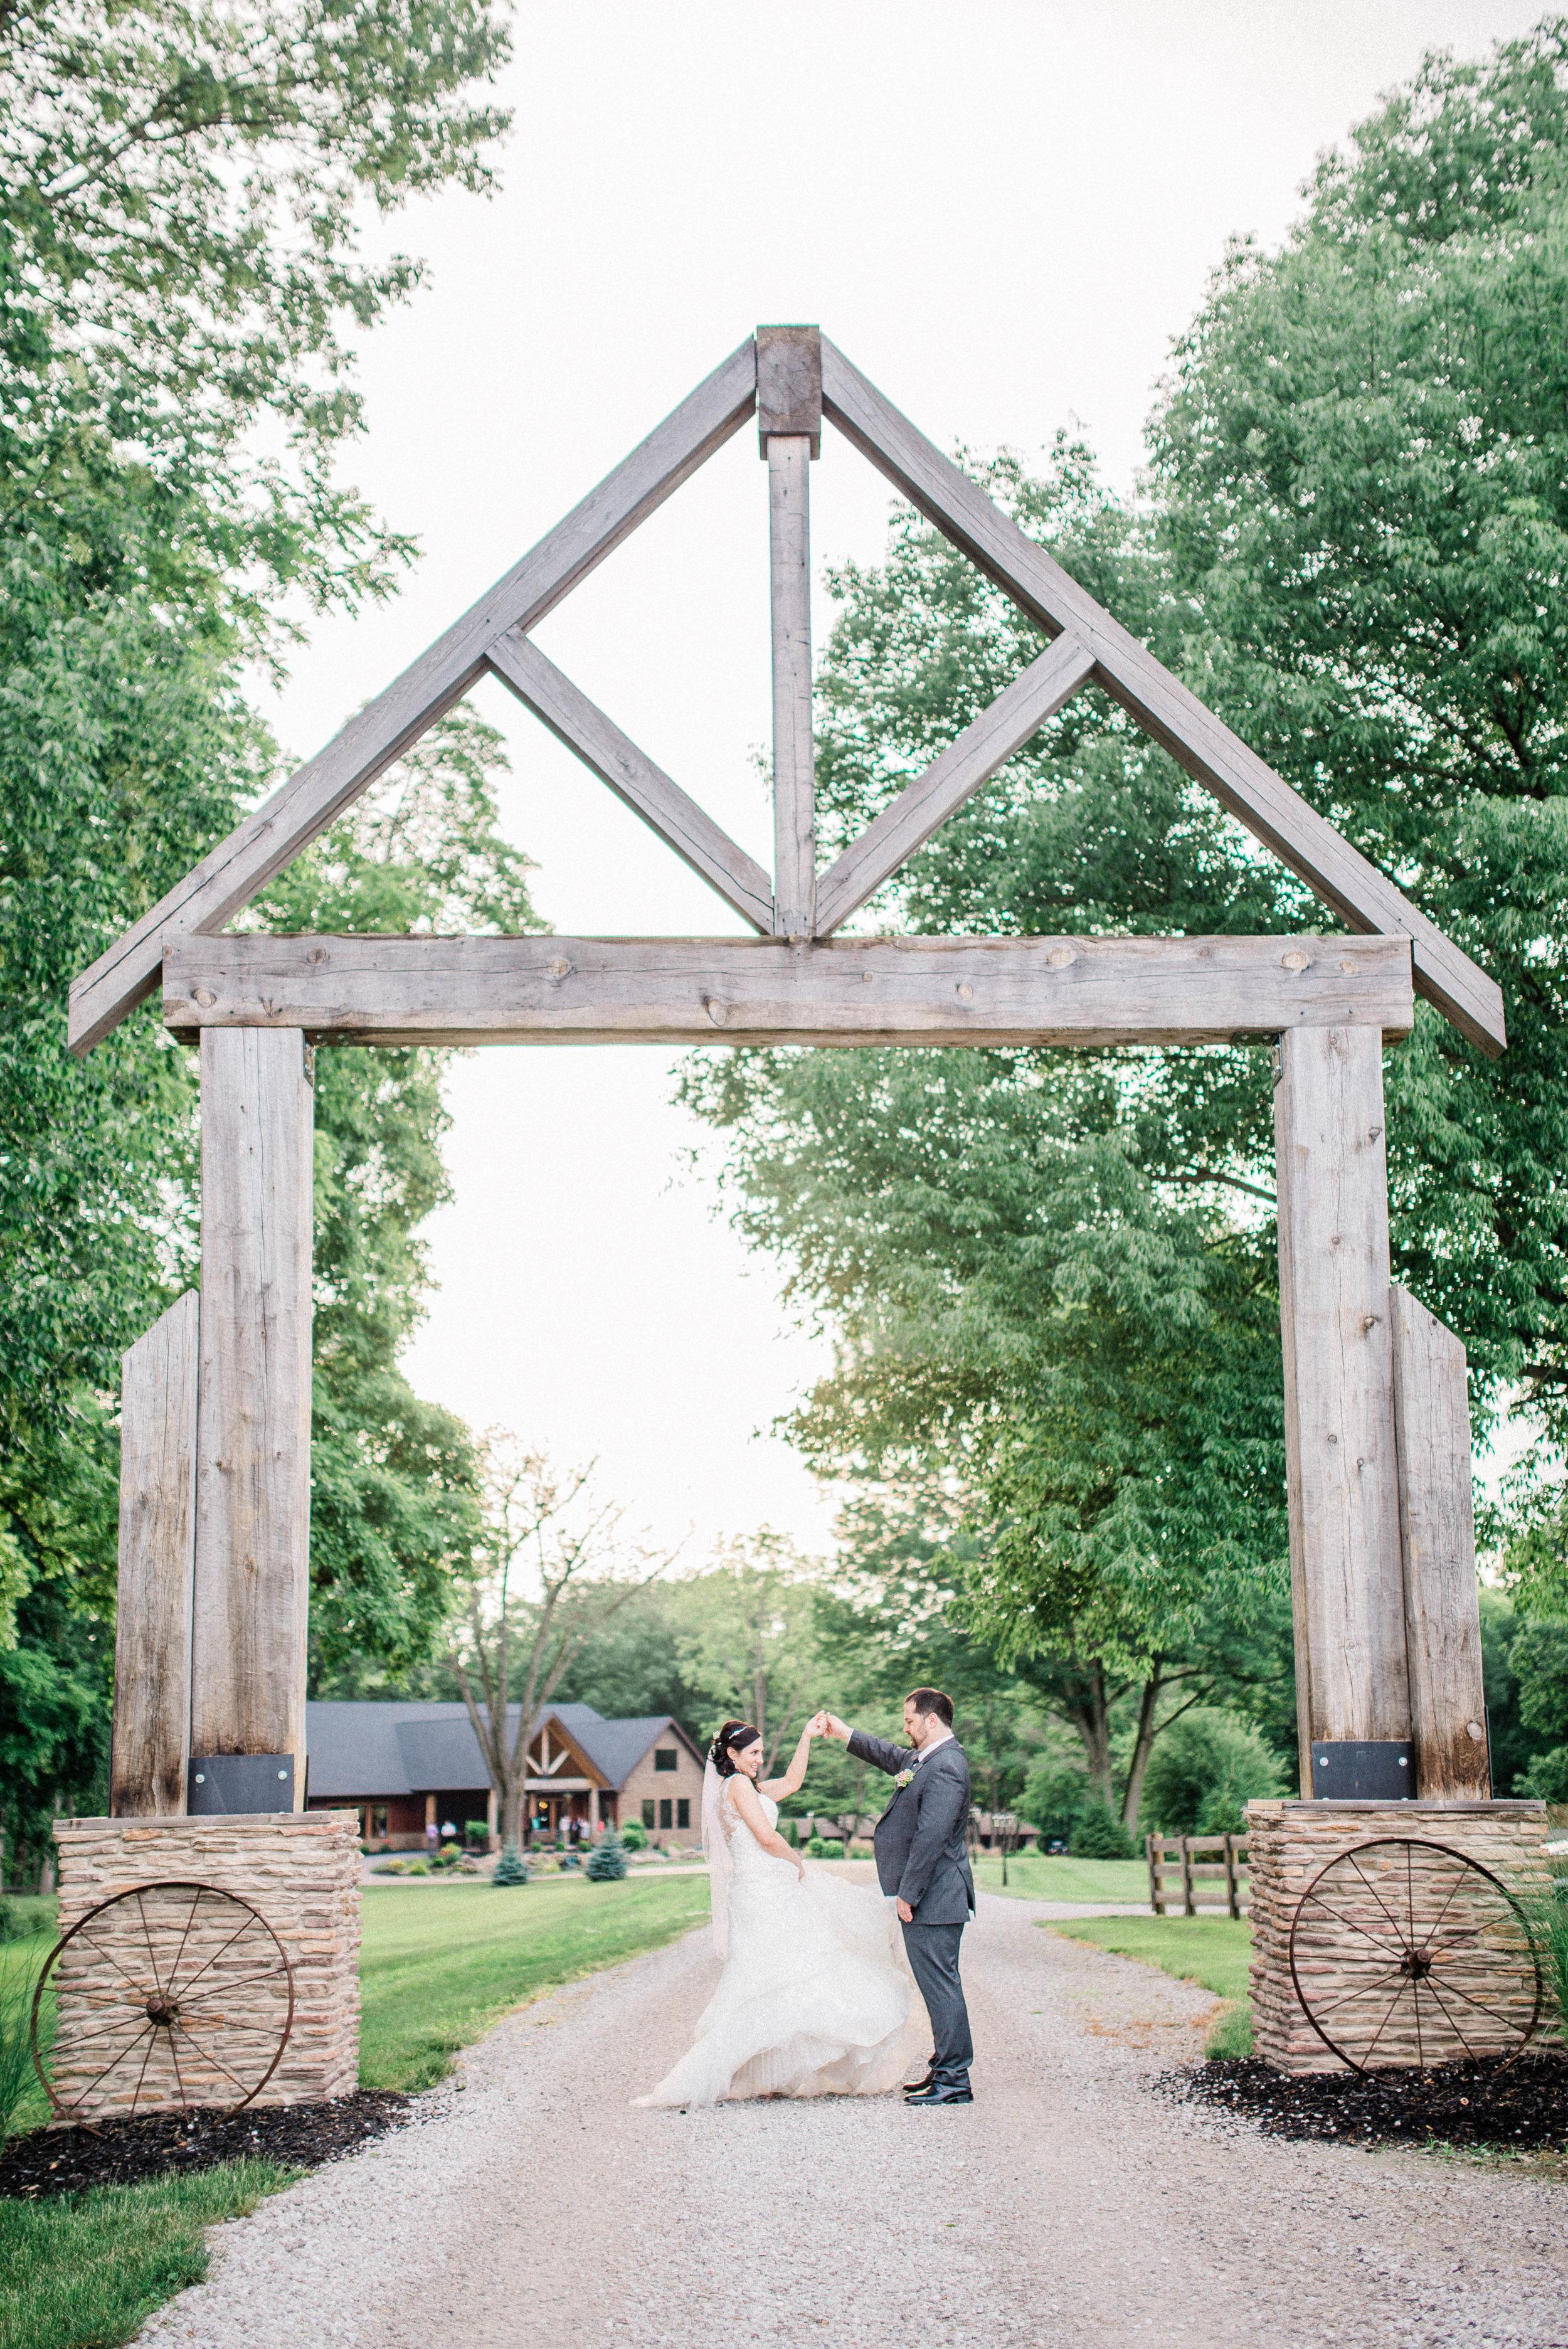 Romantic Lodge Wedding in Crawfordsville, IN | Katerina Marie Photography - Indianapolis Destination Wedding & Elopement Photographers | www.katmariepad.com